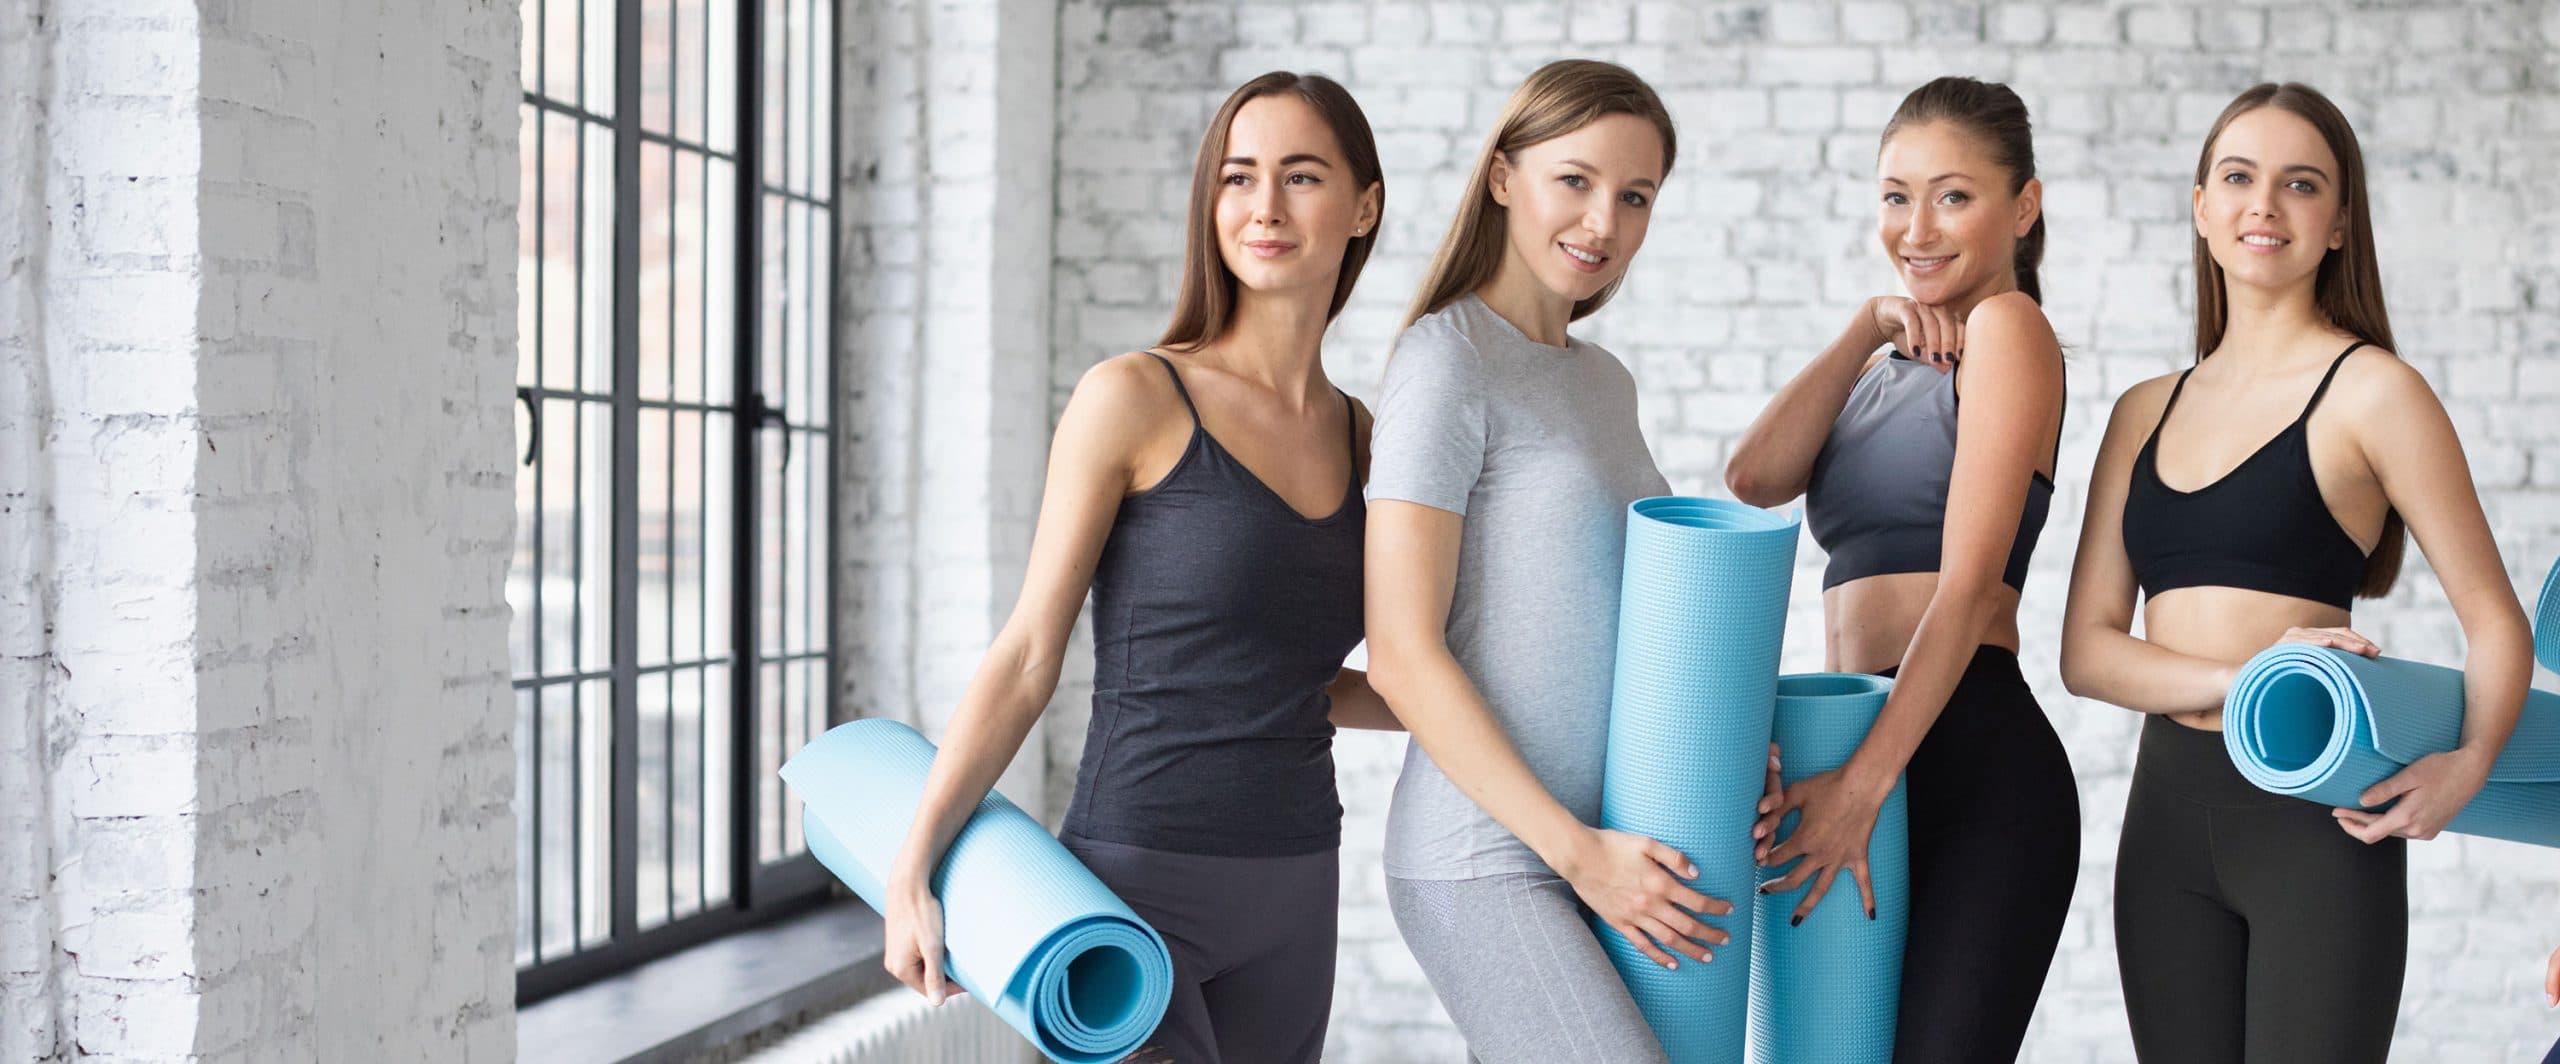 Angebot Fitnessstudio 8 Monate gratis